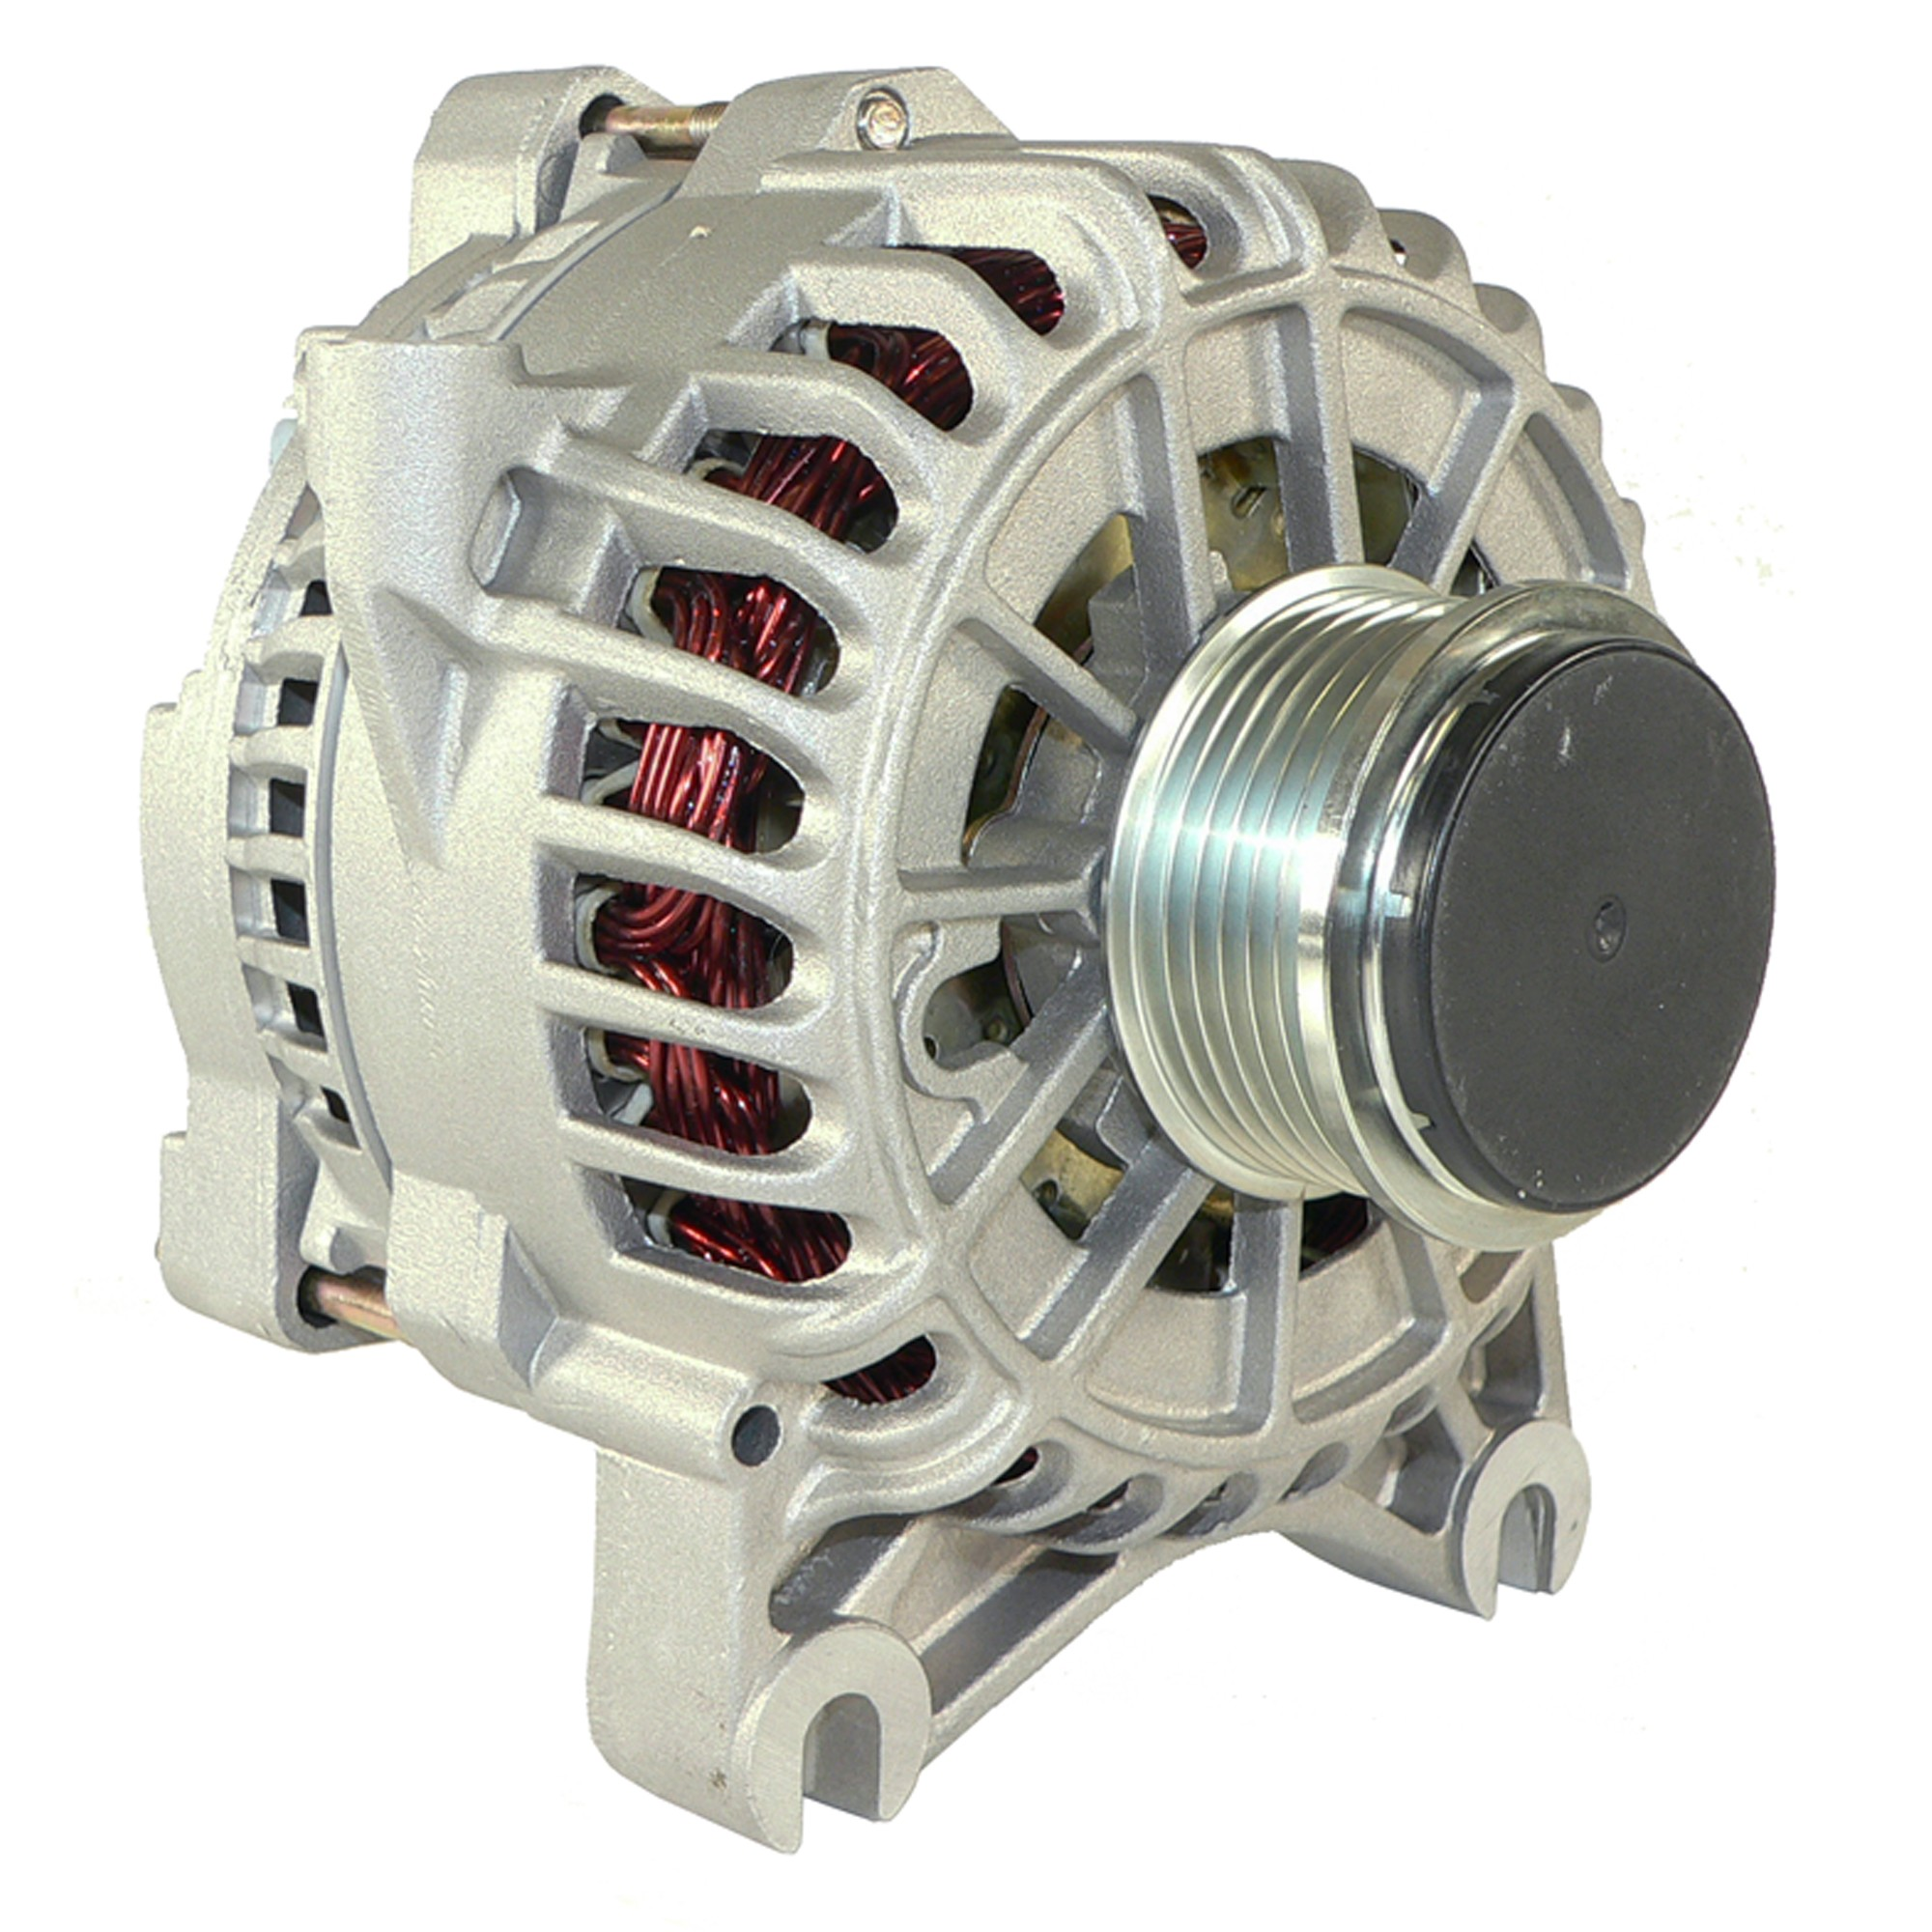 NEW ALTERNATOR 4.6 4.6L V8 FORD MUSTANG 05 06 07 08 2005 2006 2007 2008 GL-628